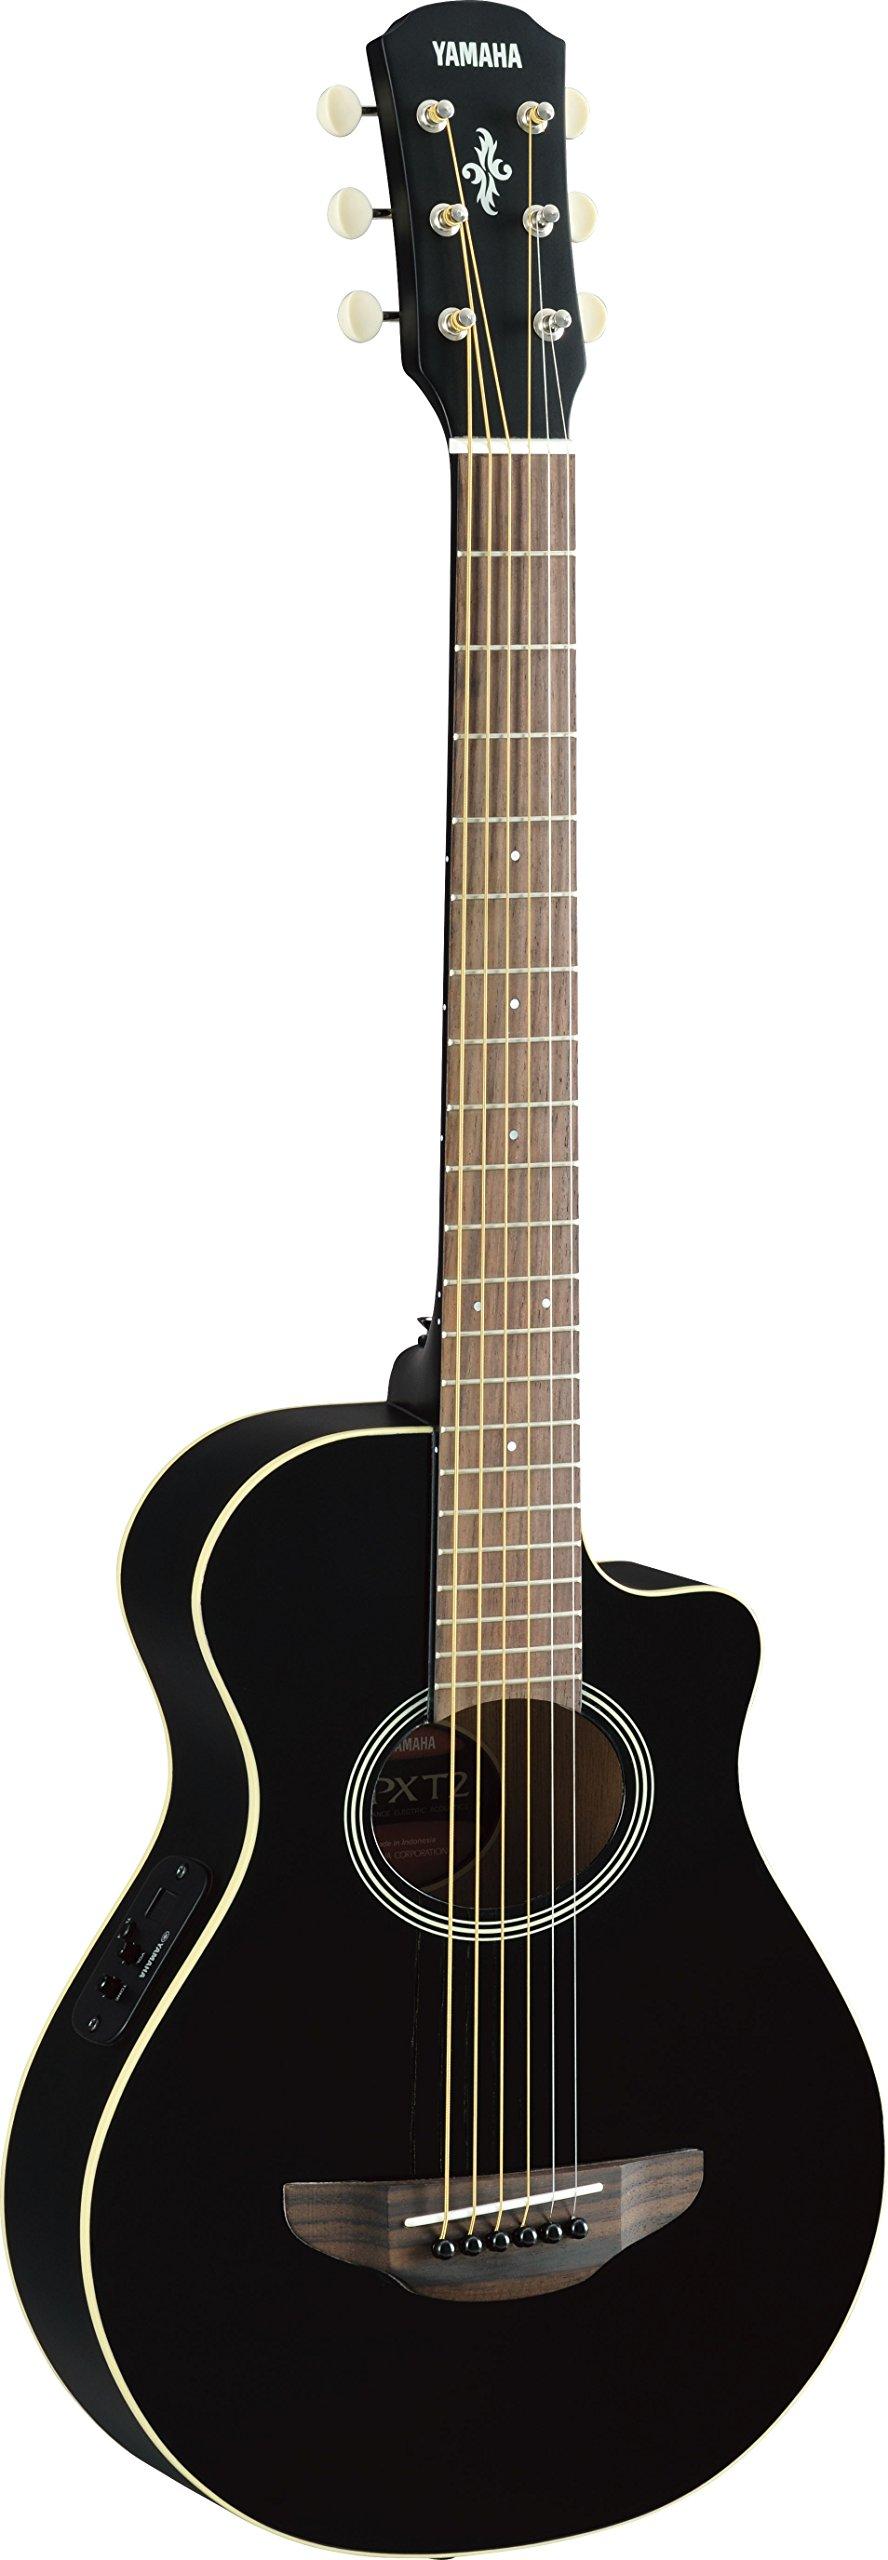 Yamaha APXT2 3/4-Size Acoustic-Electric Guitar - Black by YAMAHA